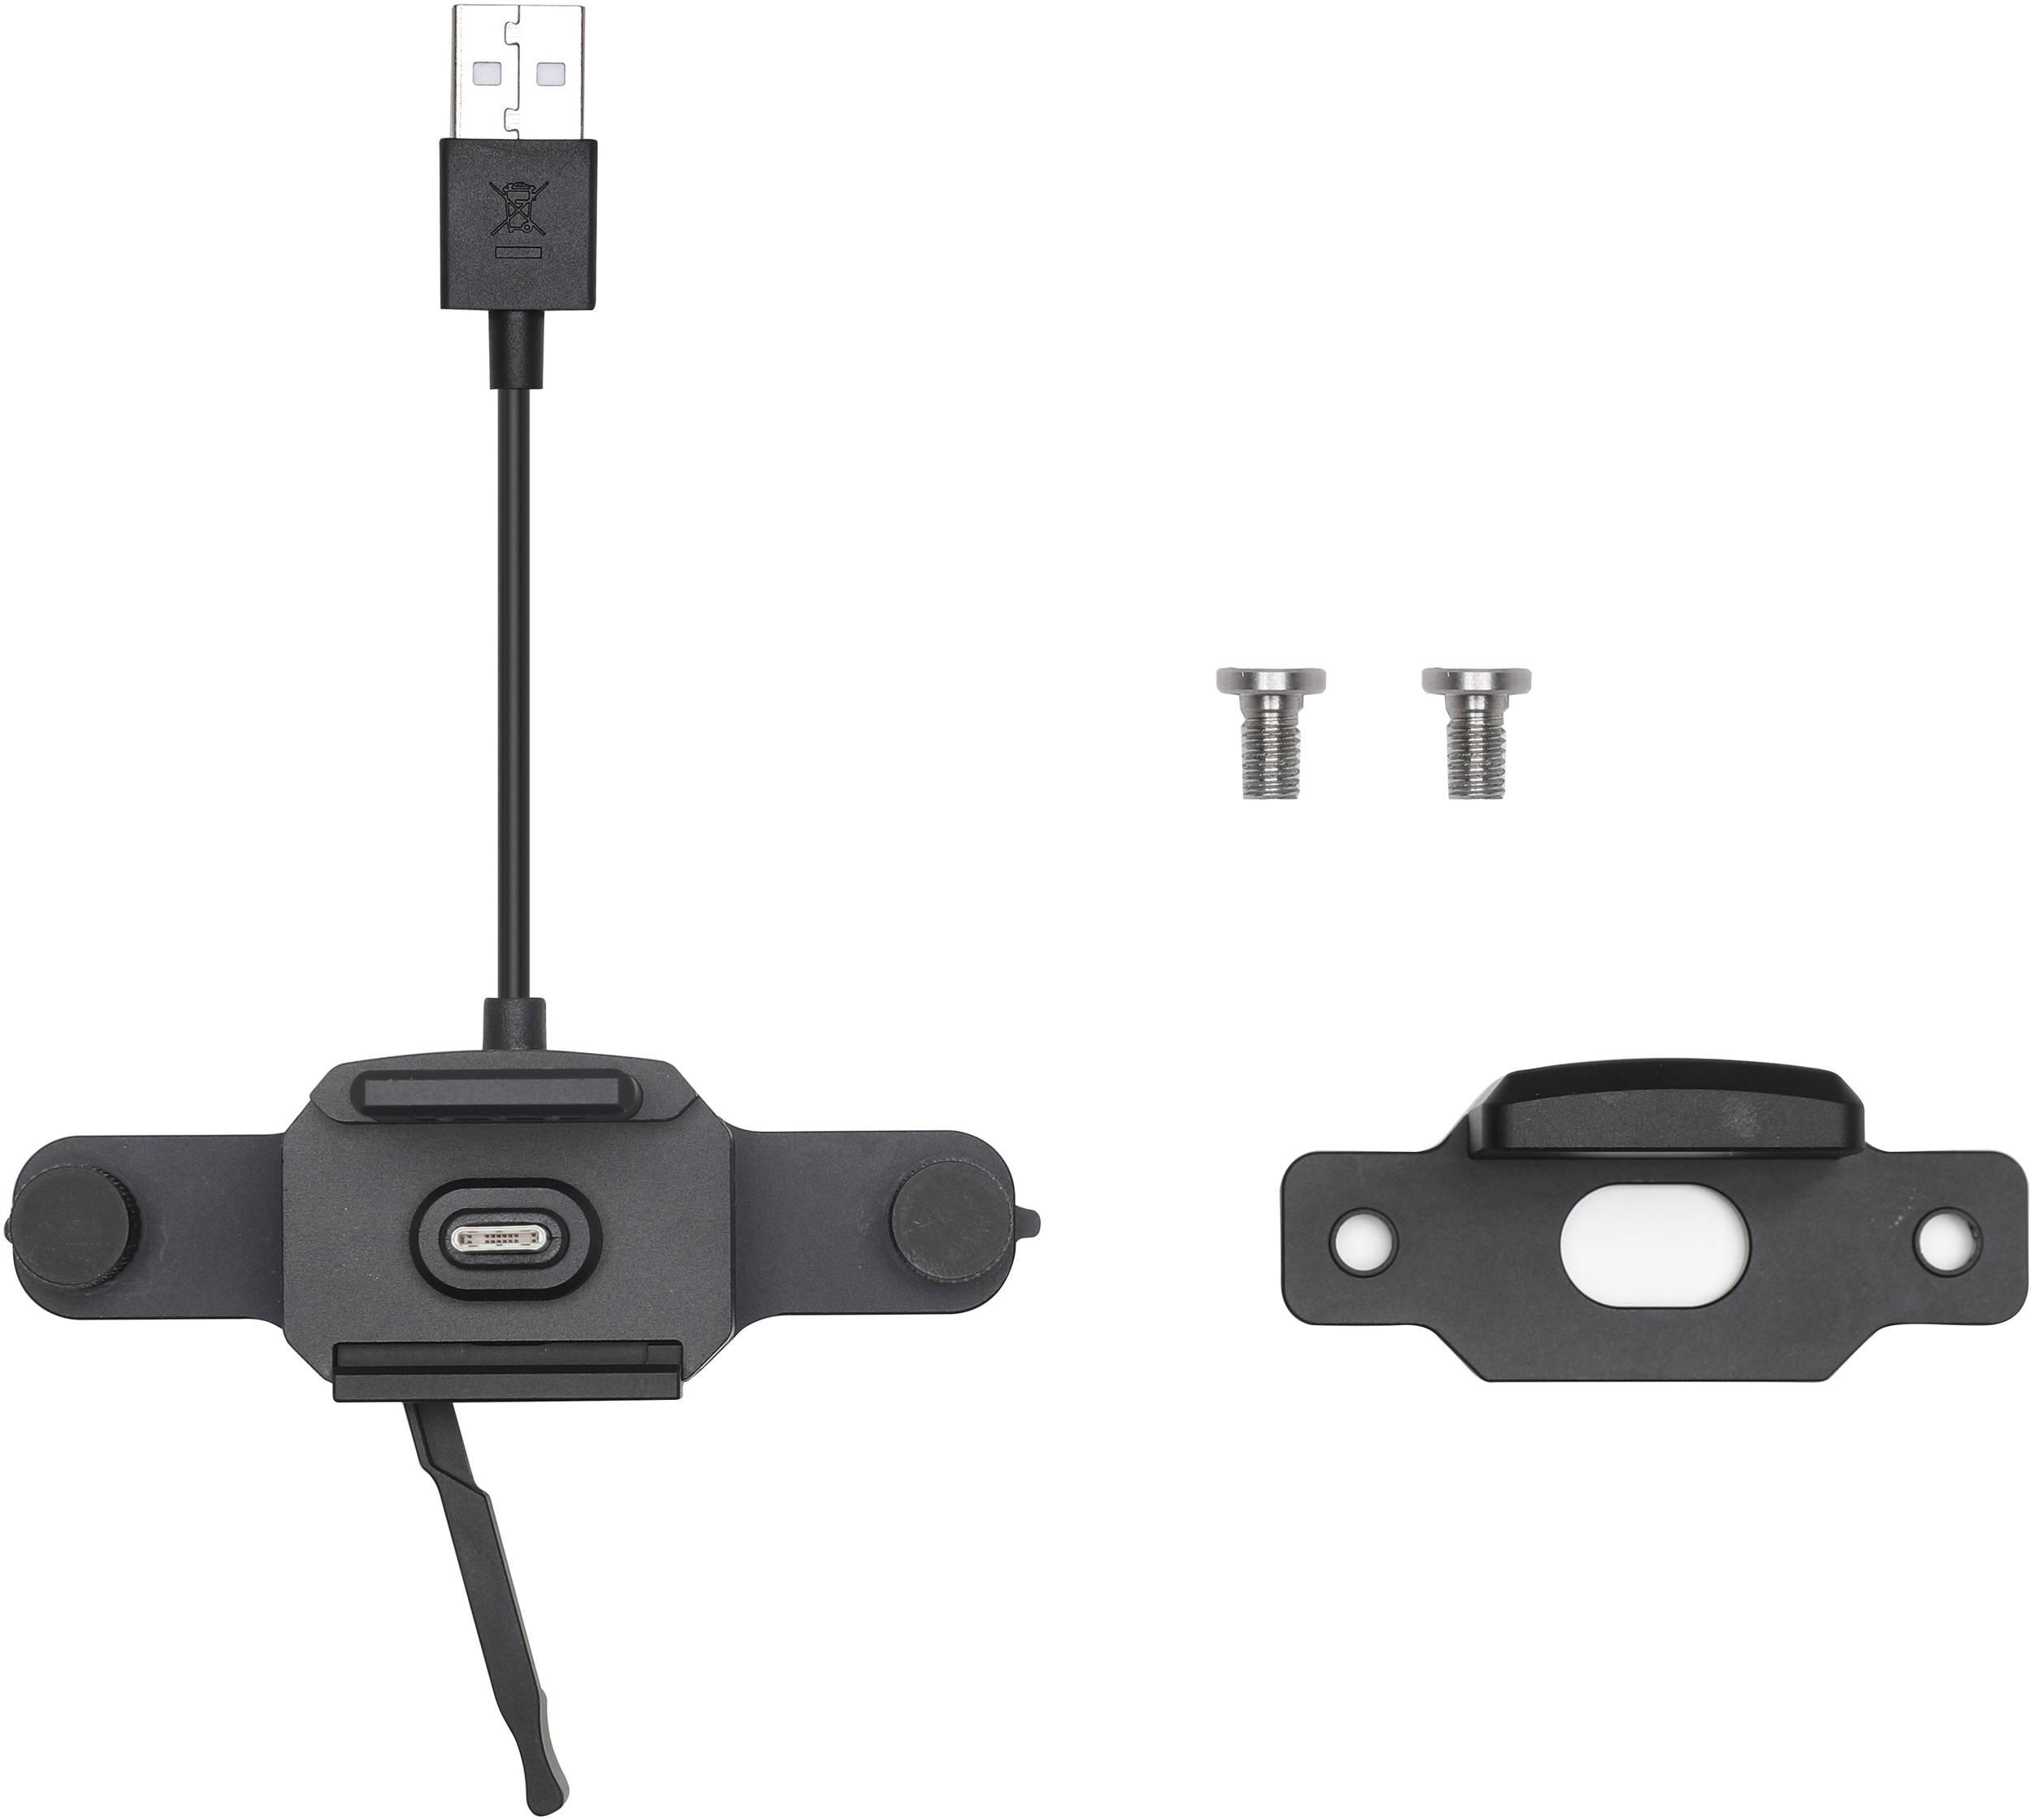 Крепежный кронштейн CrystalSky для Mavic/Spark Remote Controller Mounting Bracket-0